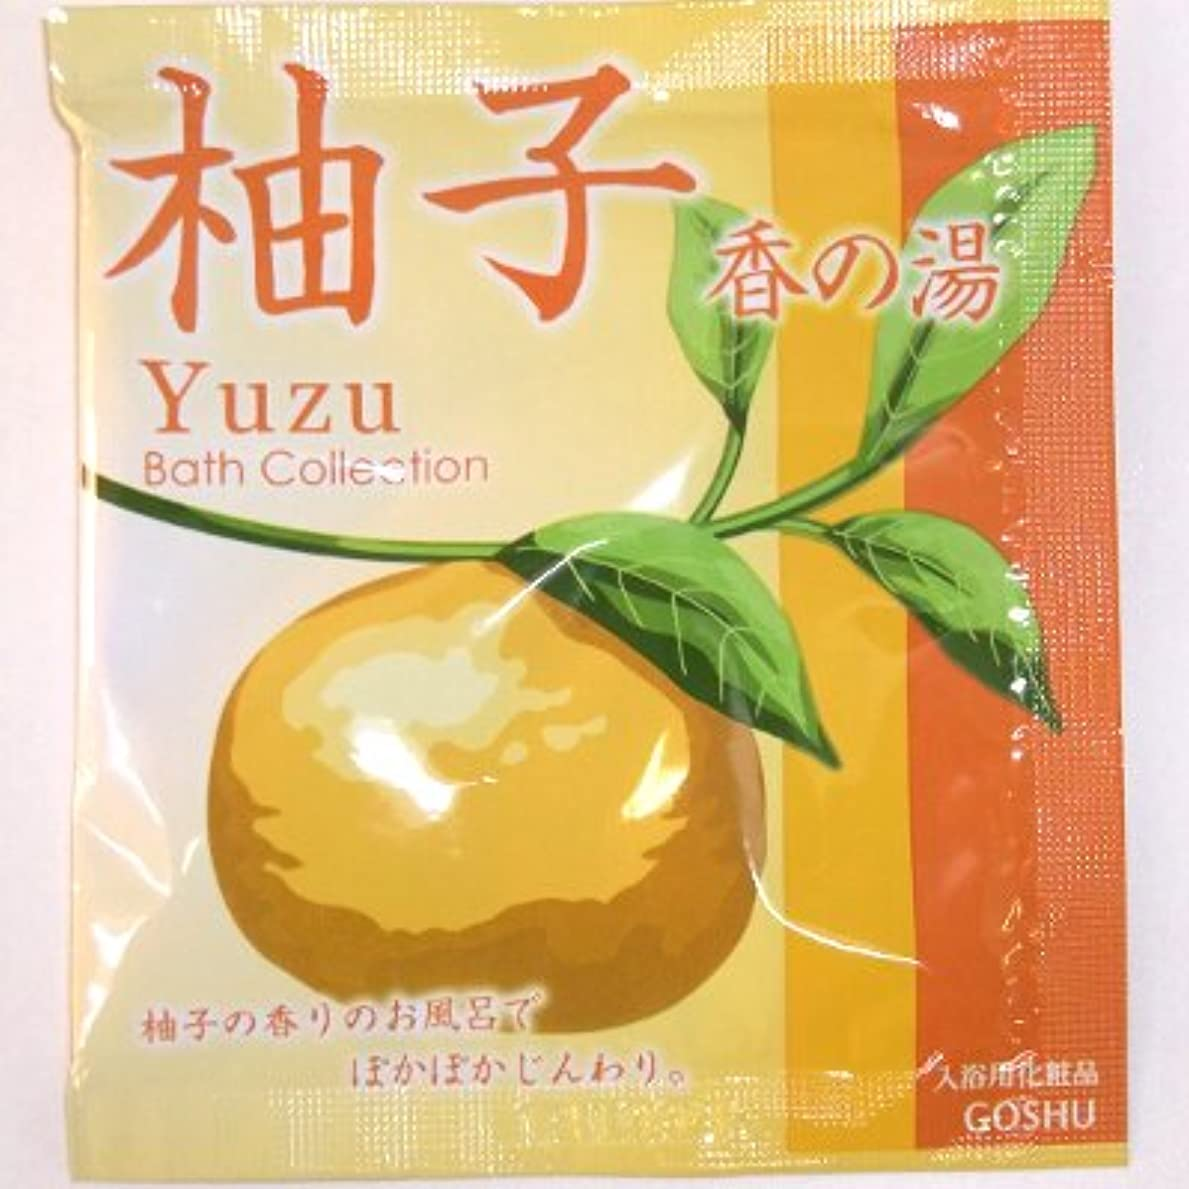 ピボットトロリー報酬香の湯 柚子